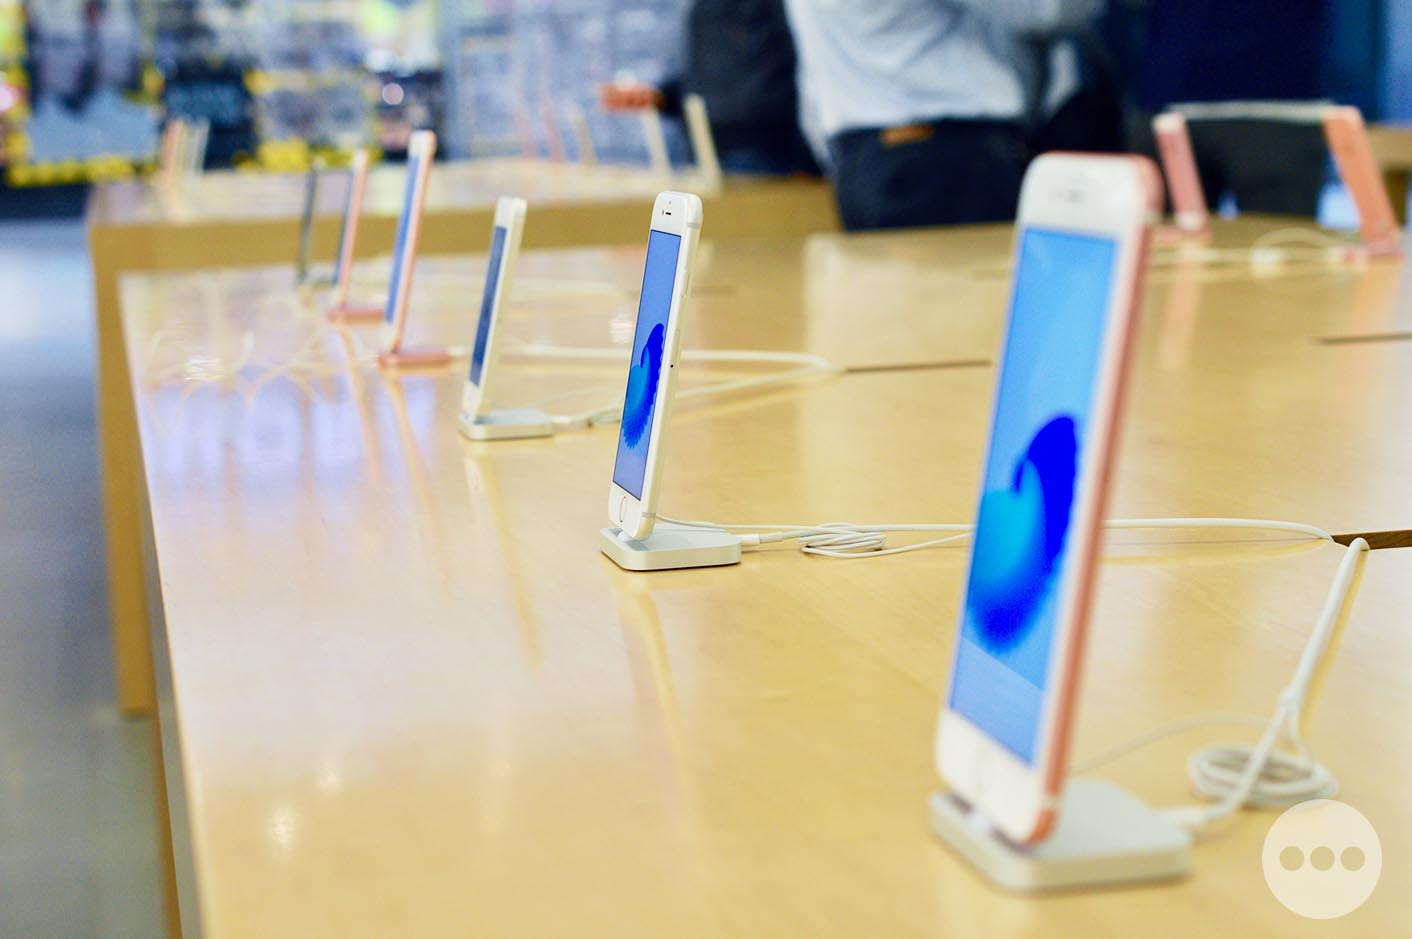 iPhone 7 Apple Store